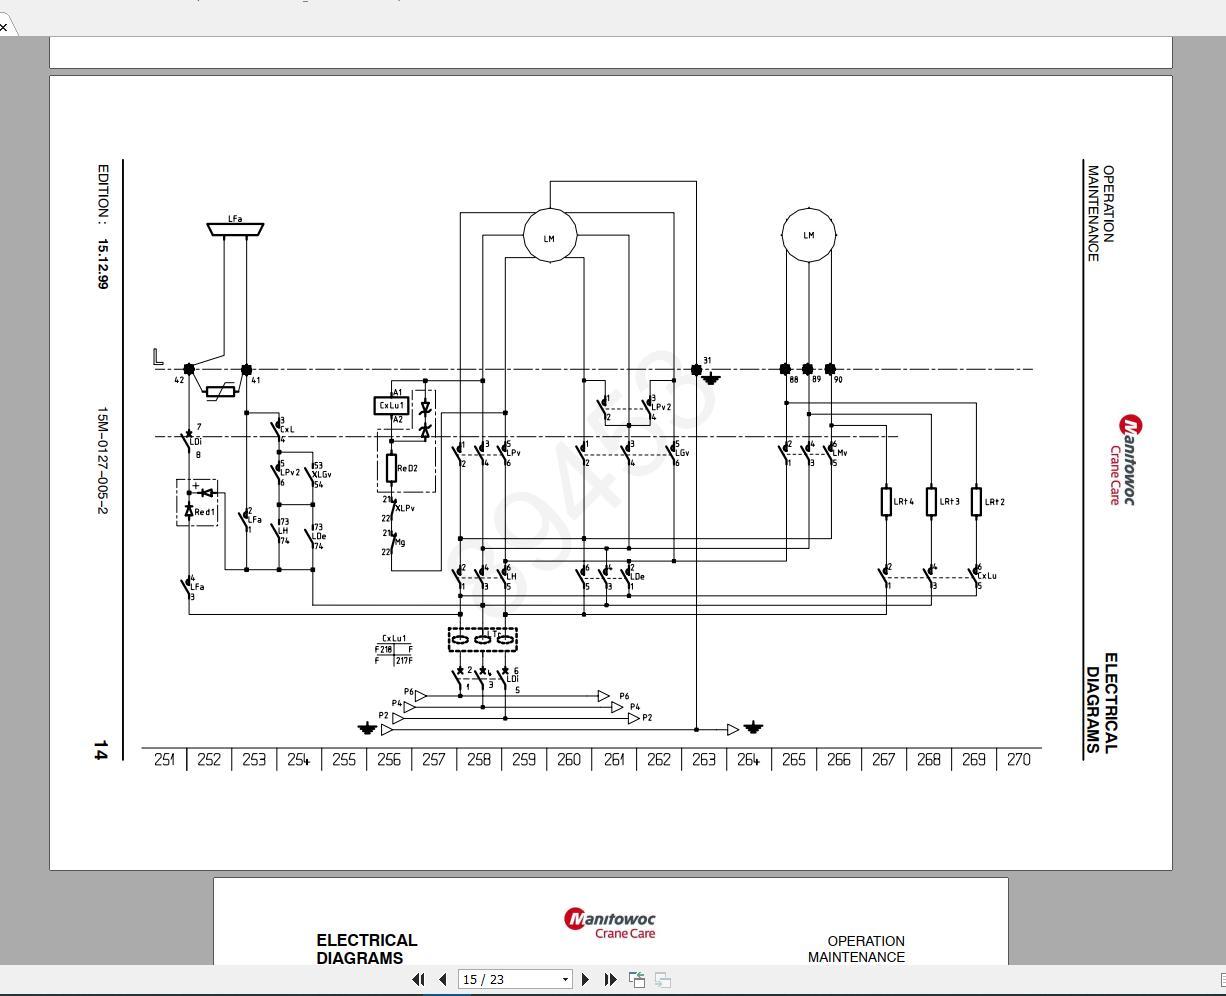 Manitowoc_Potain_Tower_Crane_Service_Manual_DVD8